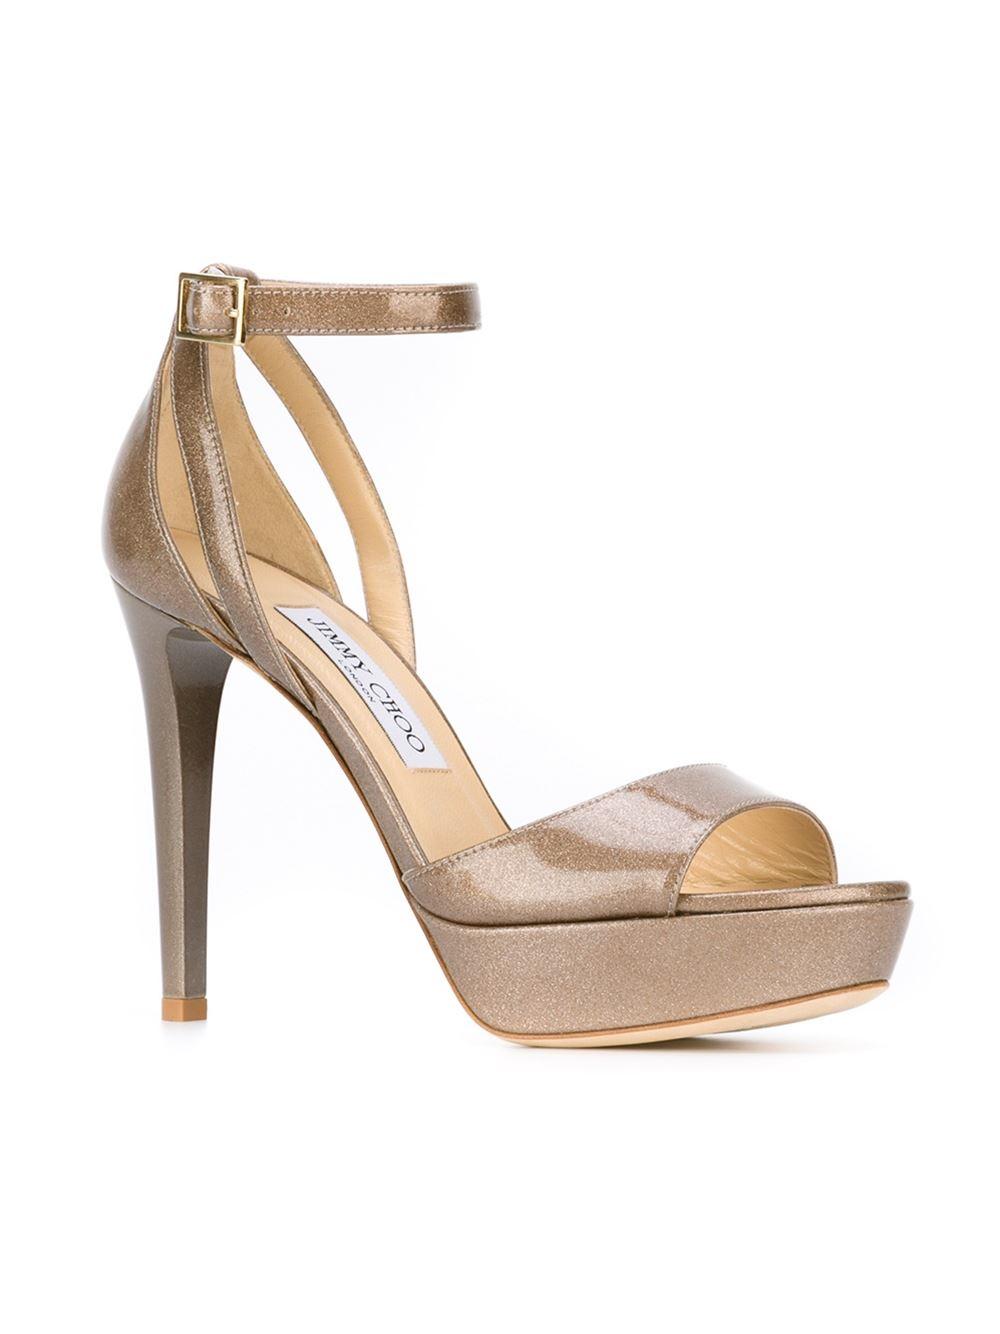 Lyst Jimmy Choo Kayden Sandals In Metallic